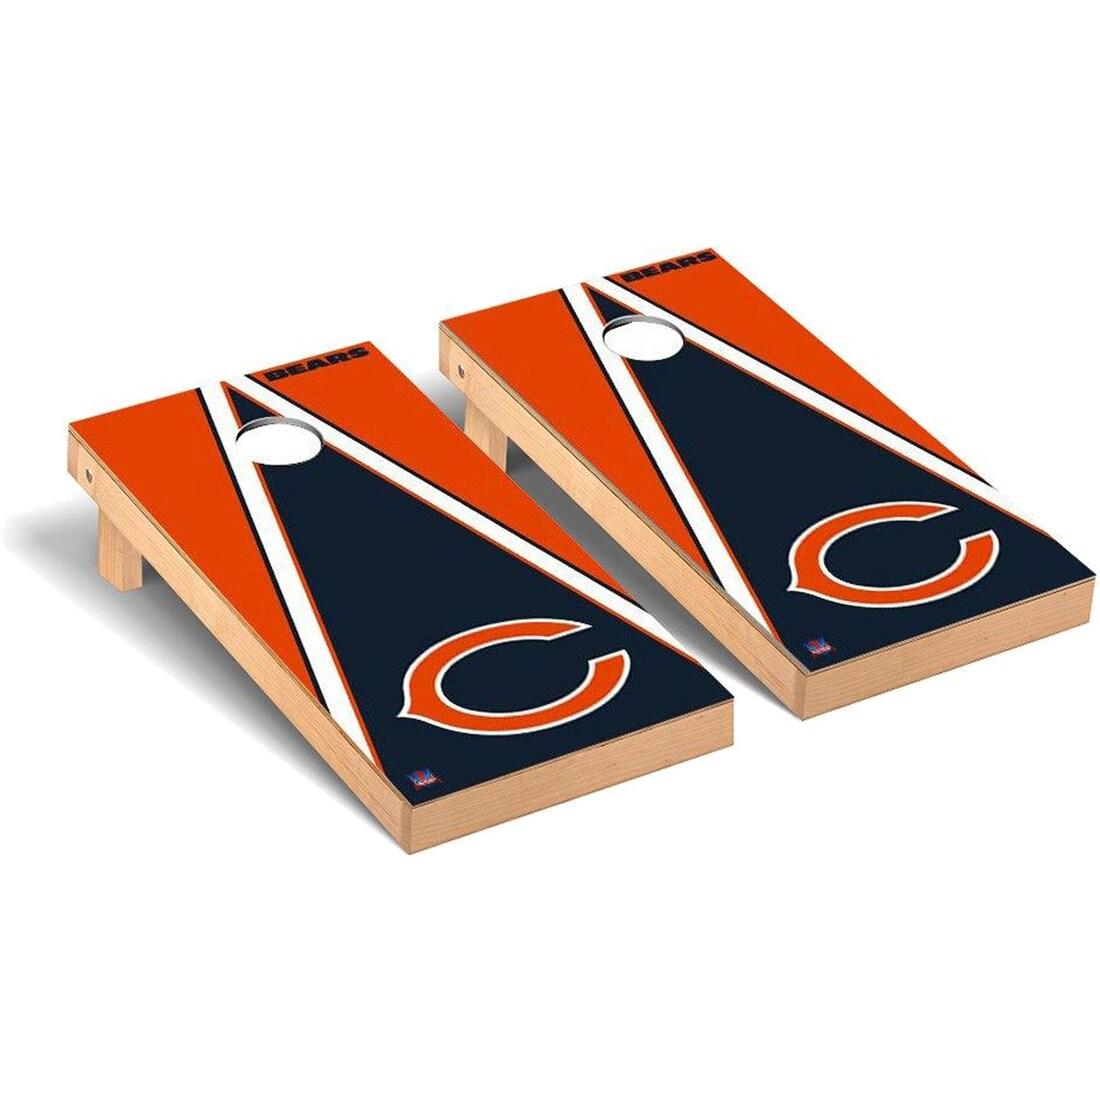 Chicago Bears 2' x 4' Triangle Cornhole Board Tailgate Toss Set